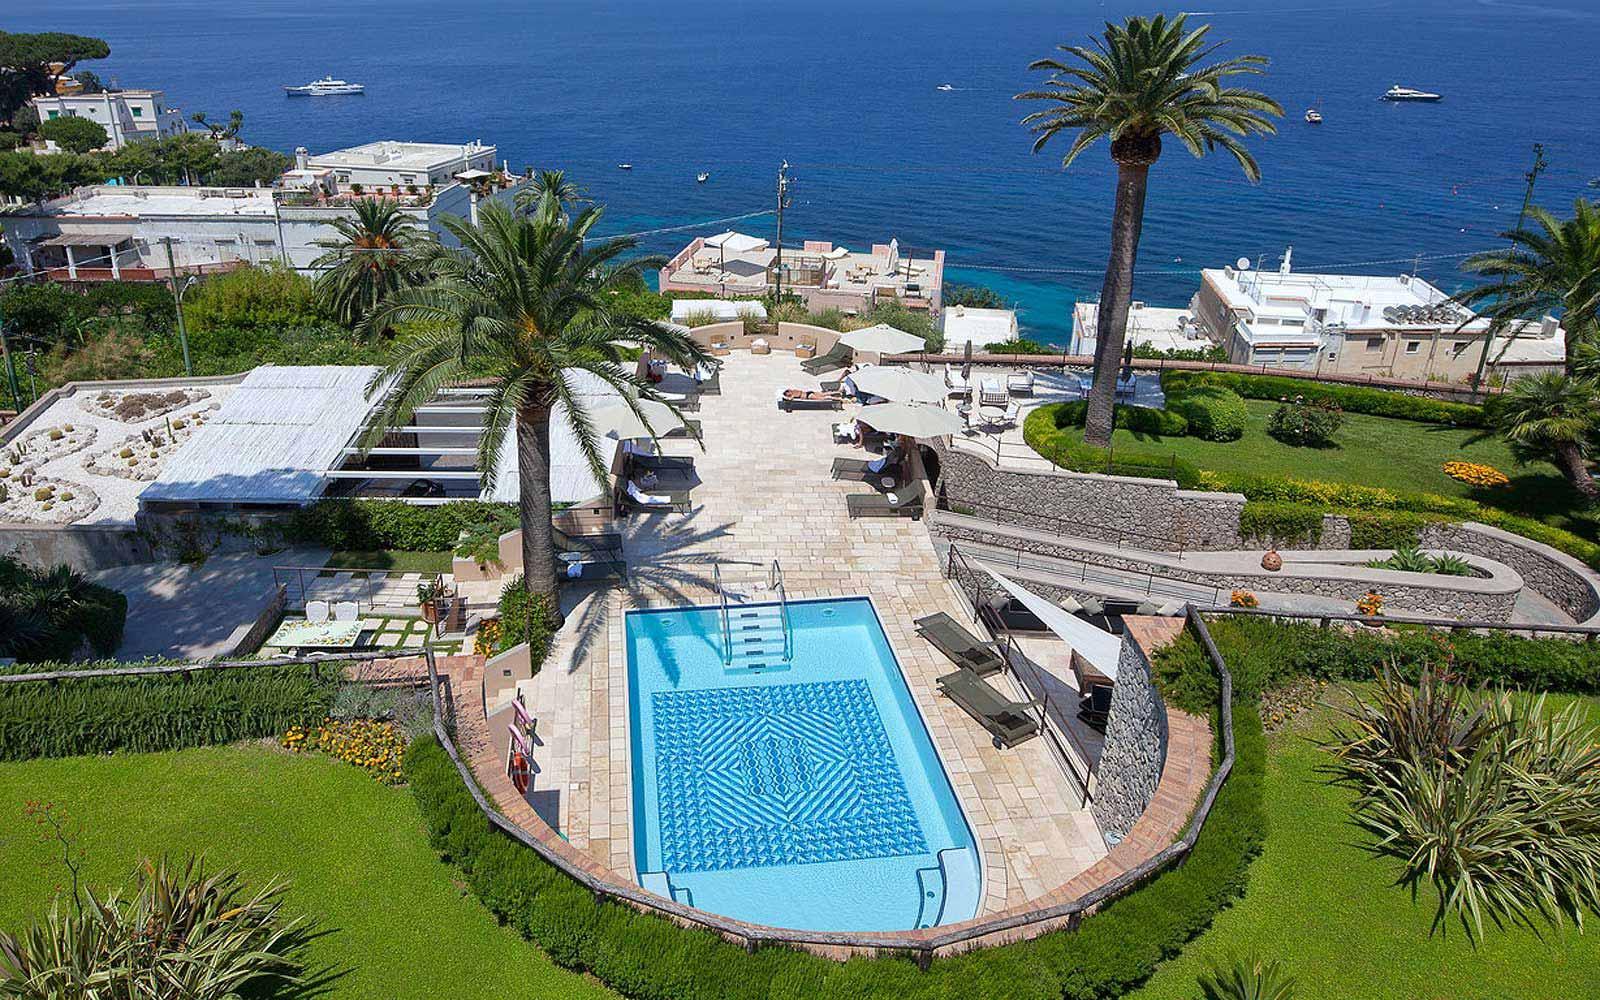 Panoramic view of the Villa Marini Capri Hotel & Spa